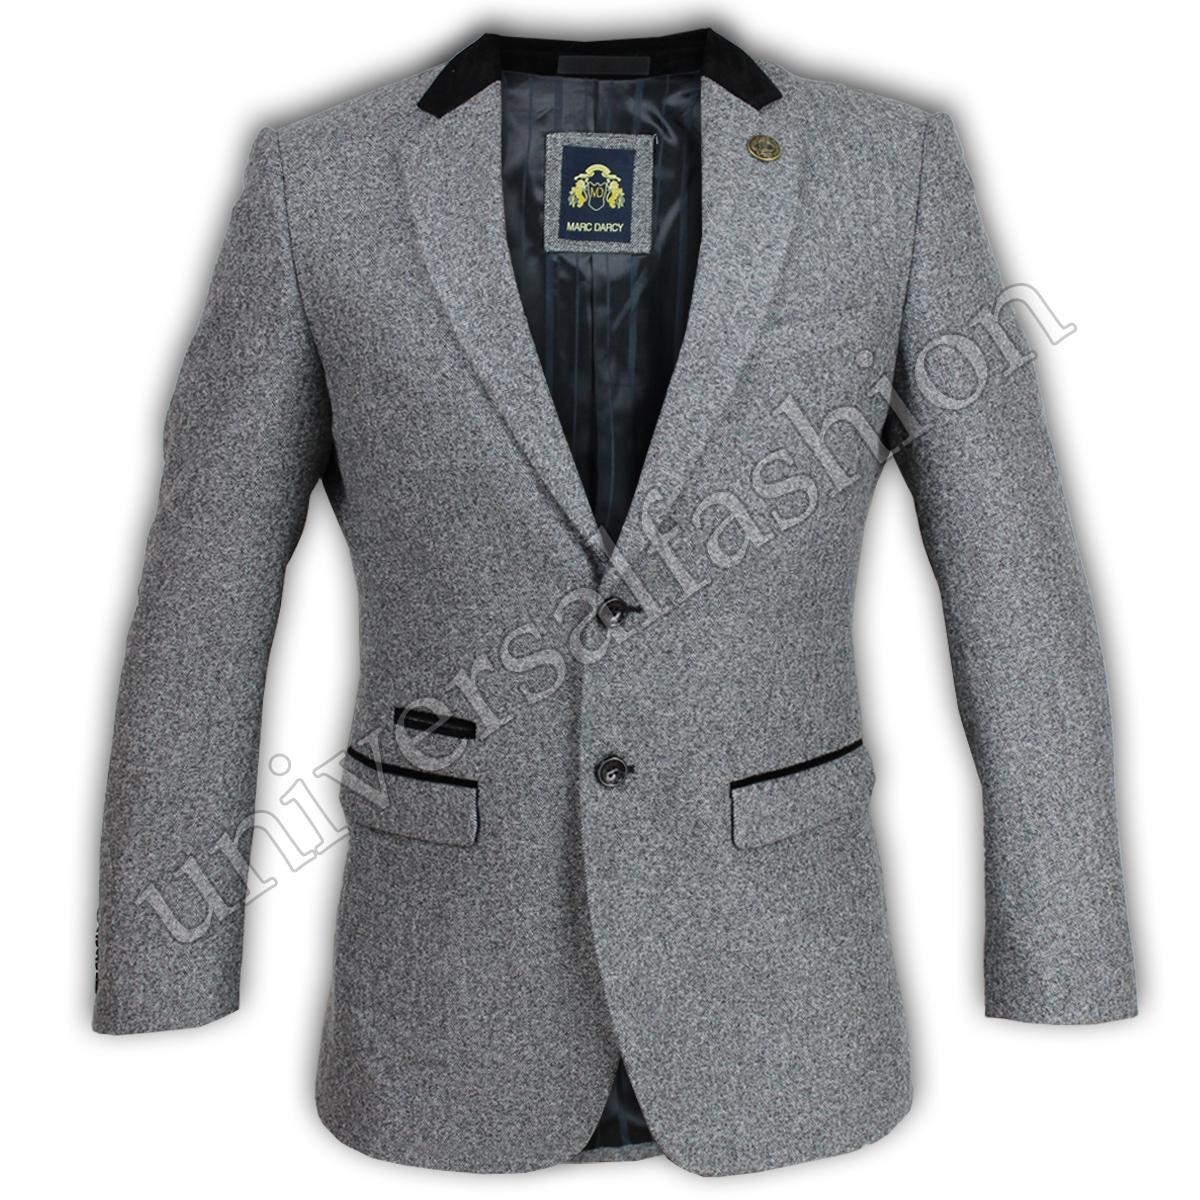 Mens-Blazer-Marc-Darcy-Coat-Formal-Suit-Jacket-Patches-Herringbone-Designer-New